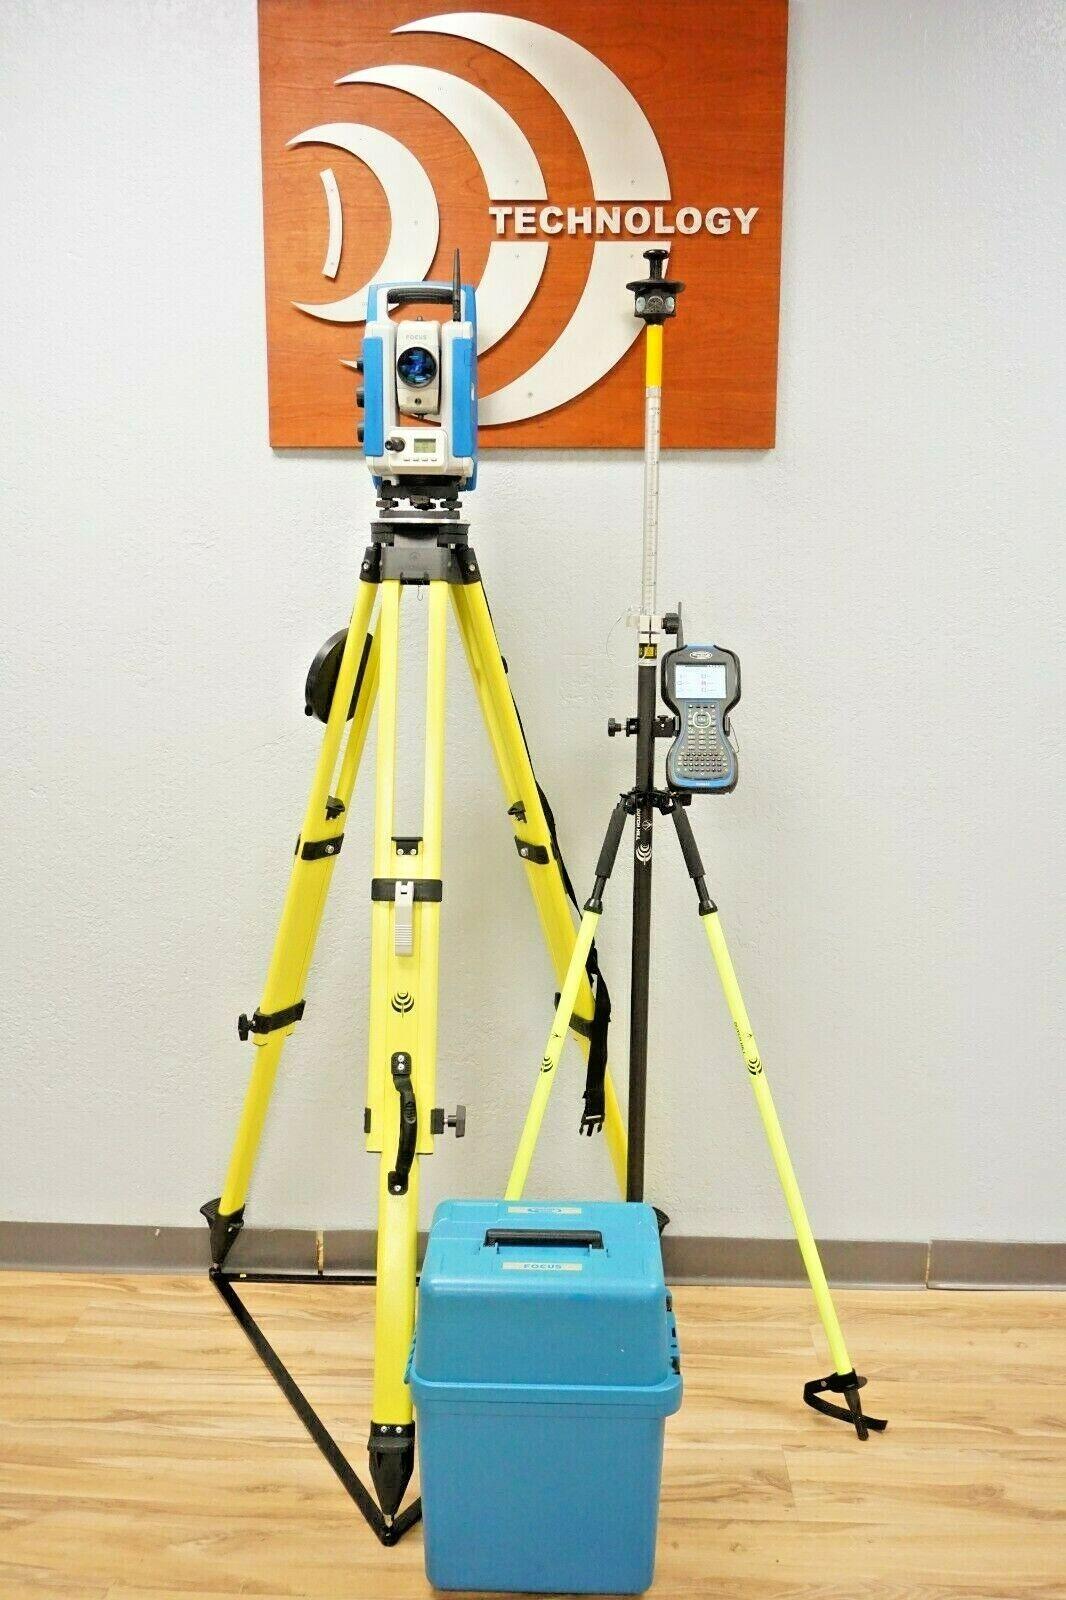 "Spectra Precision Focus 35 5"" Robotic Total Station Ranger 3 Layout Pro"